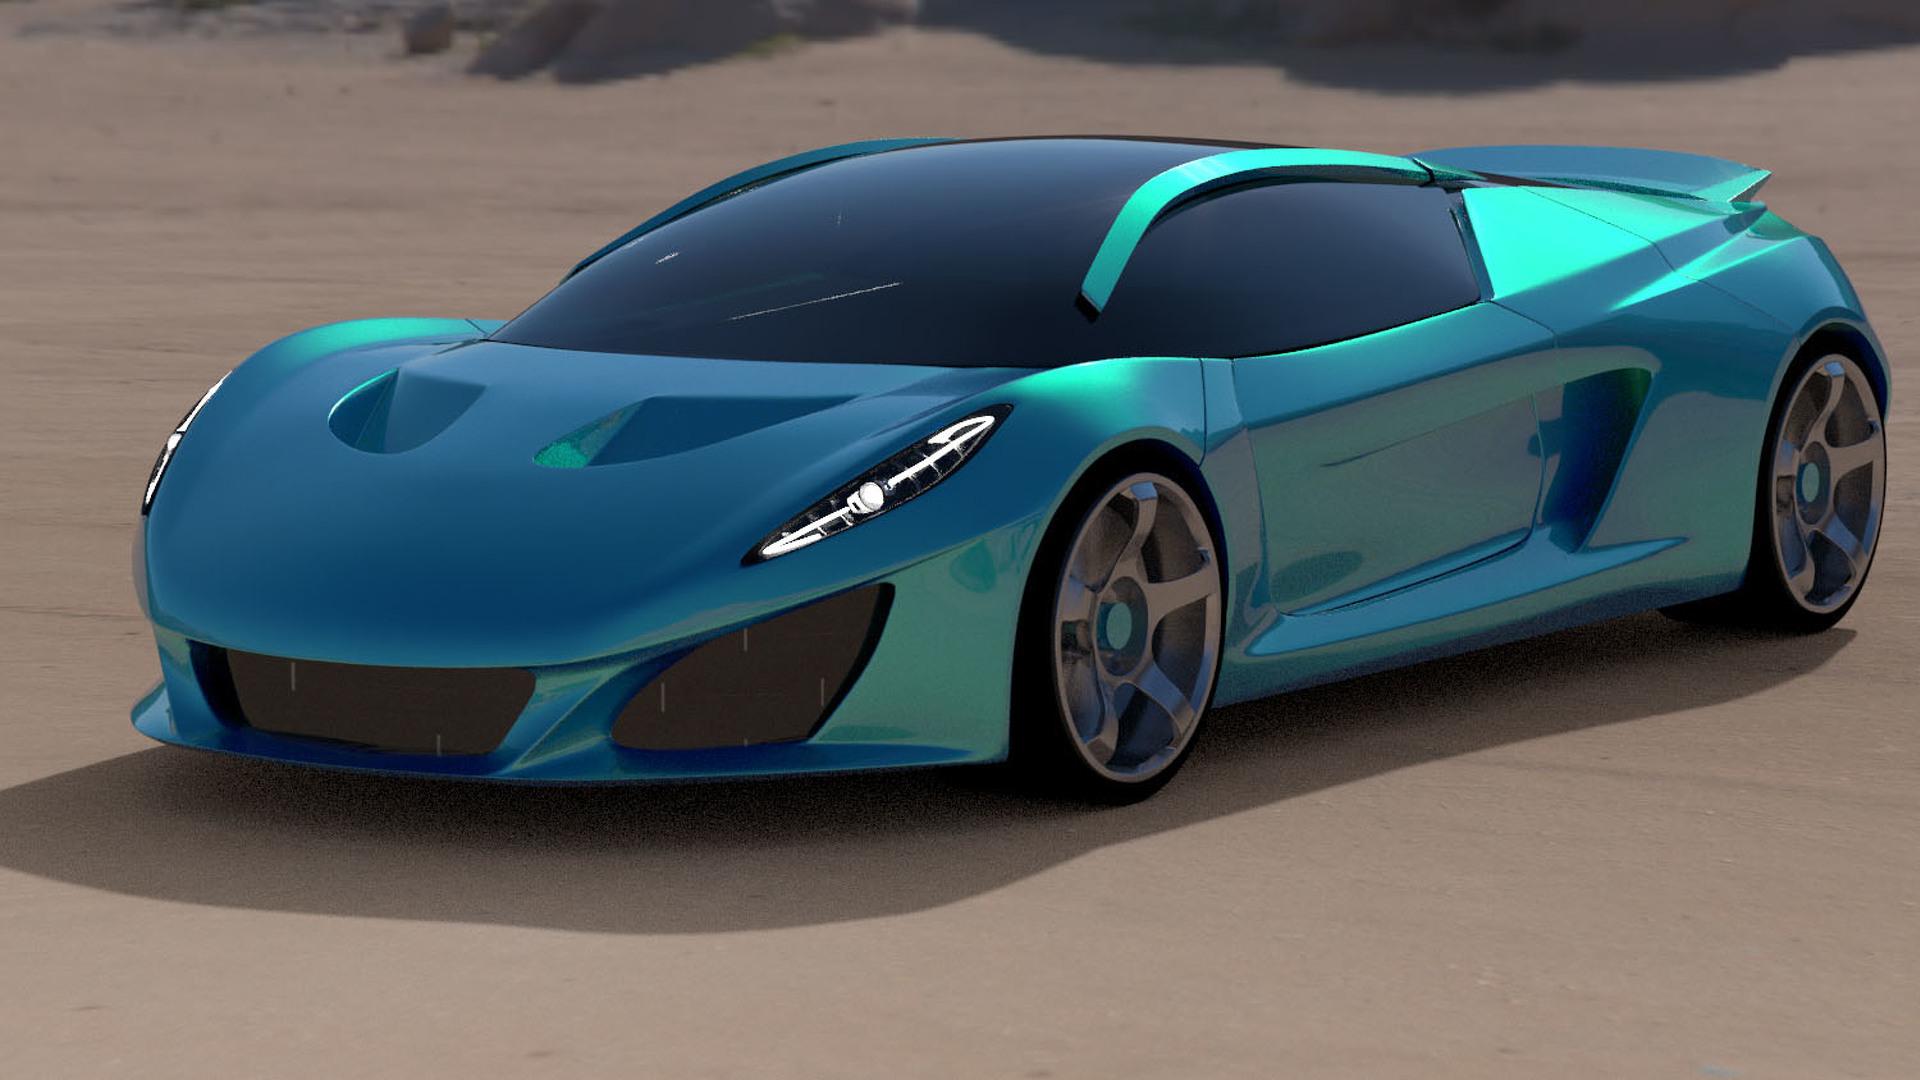 Keating Supercars teases the Berus ahead of 2017 debut